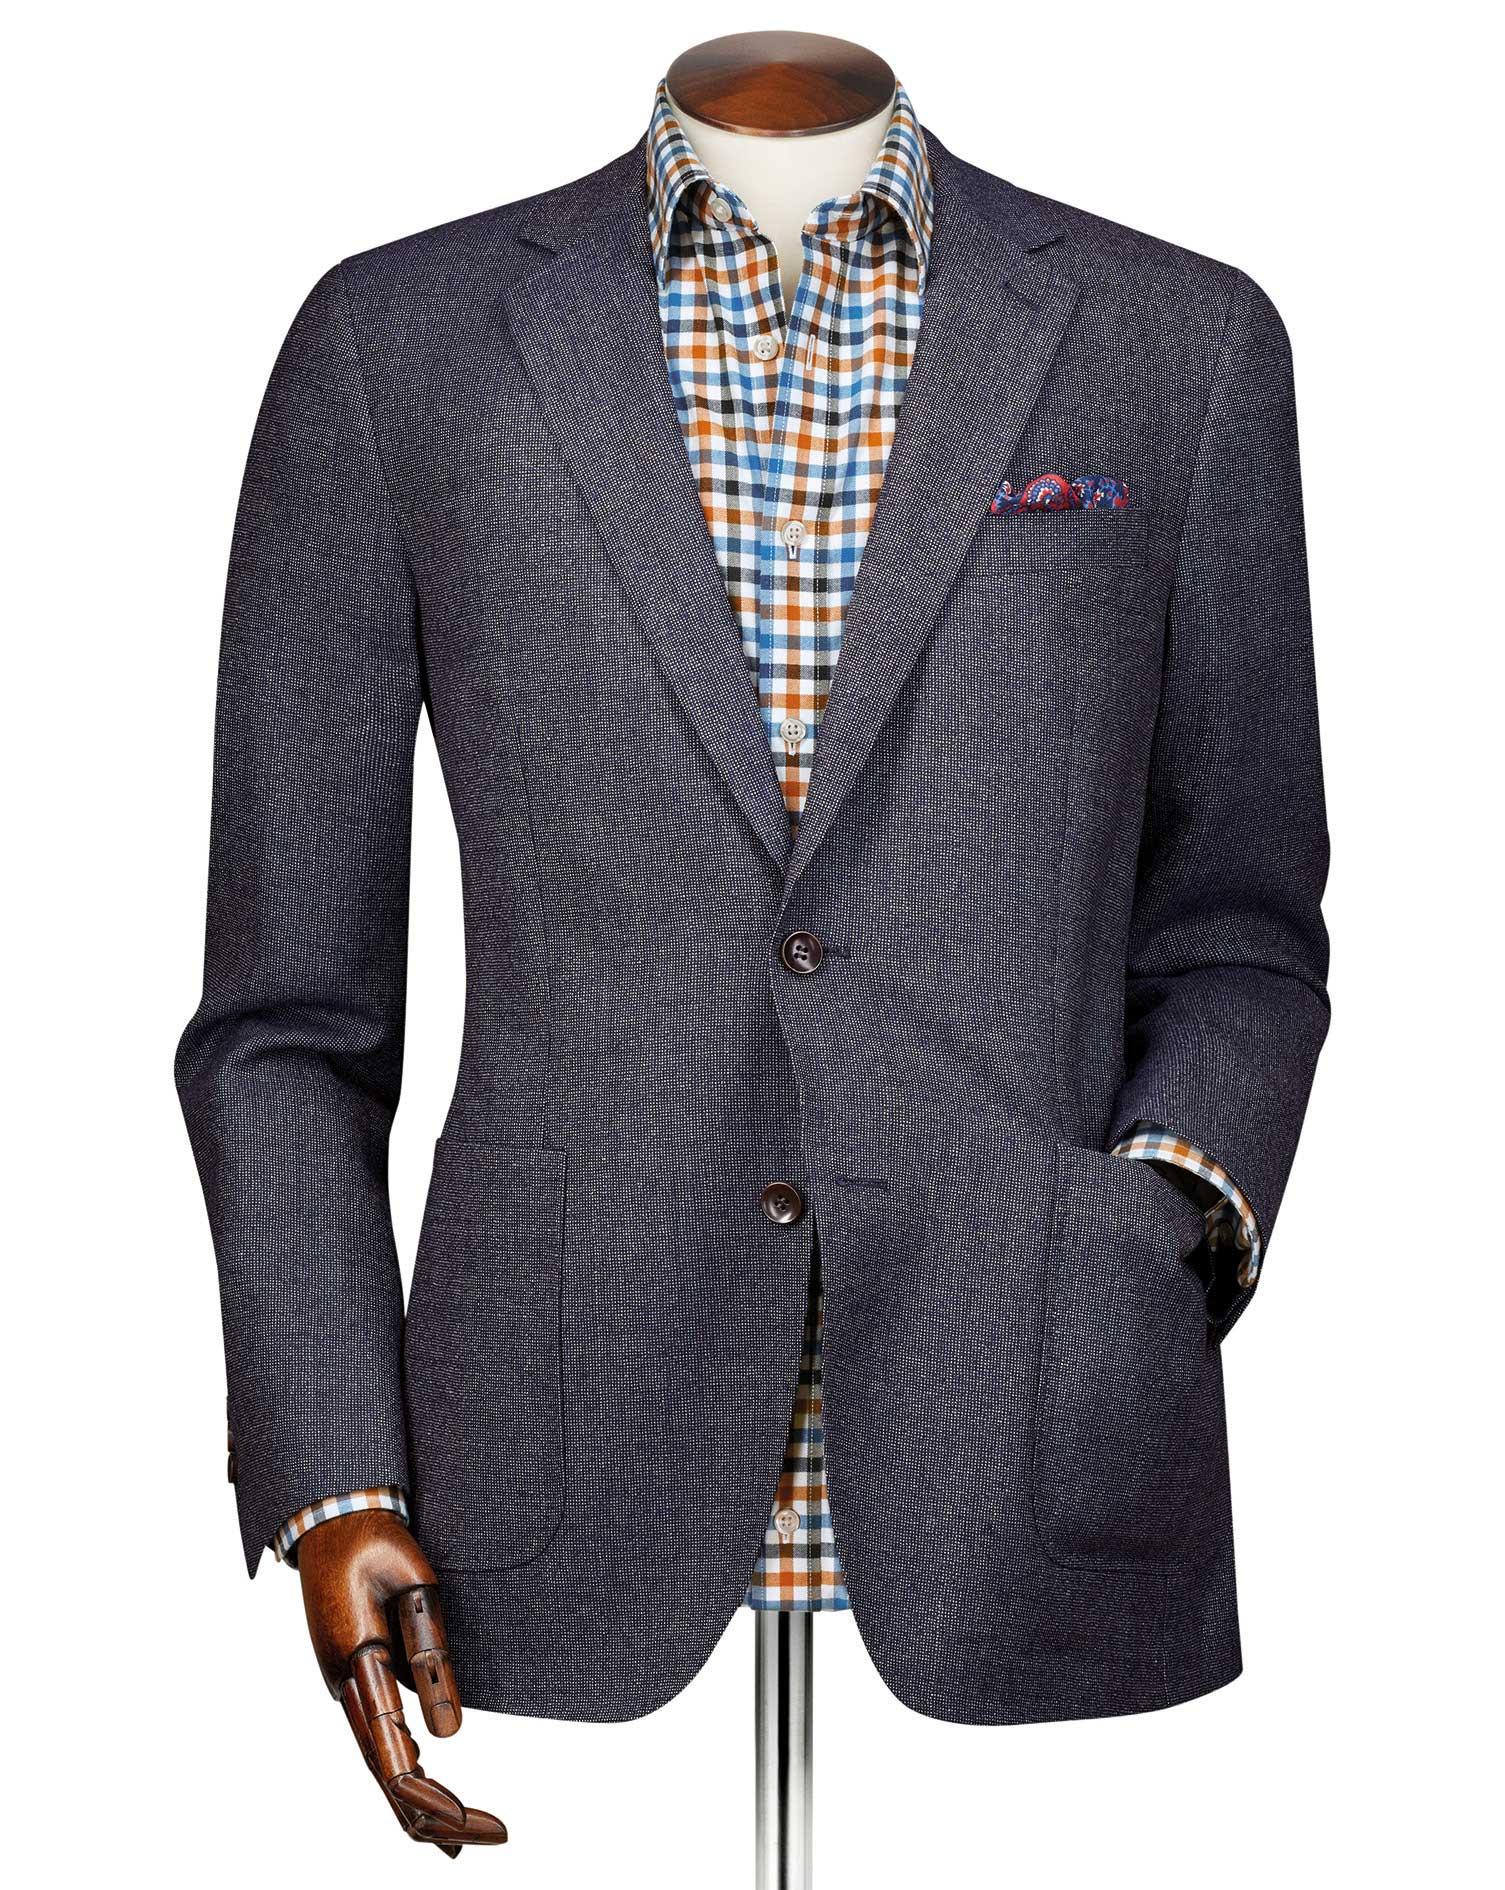 Slim Fit Navy Modern Wool Blazer Size 44 Long by Charles Tyrwhitt